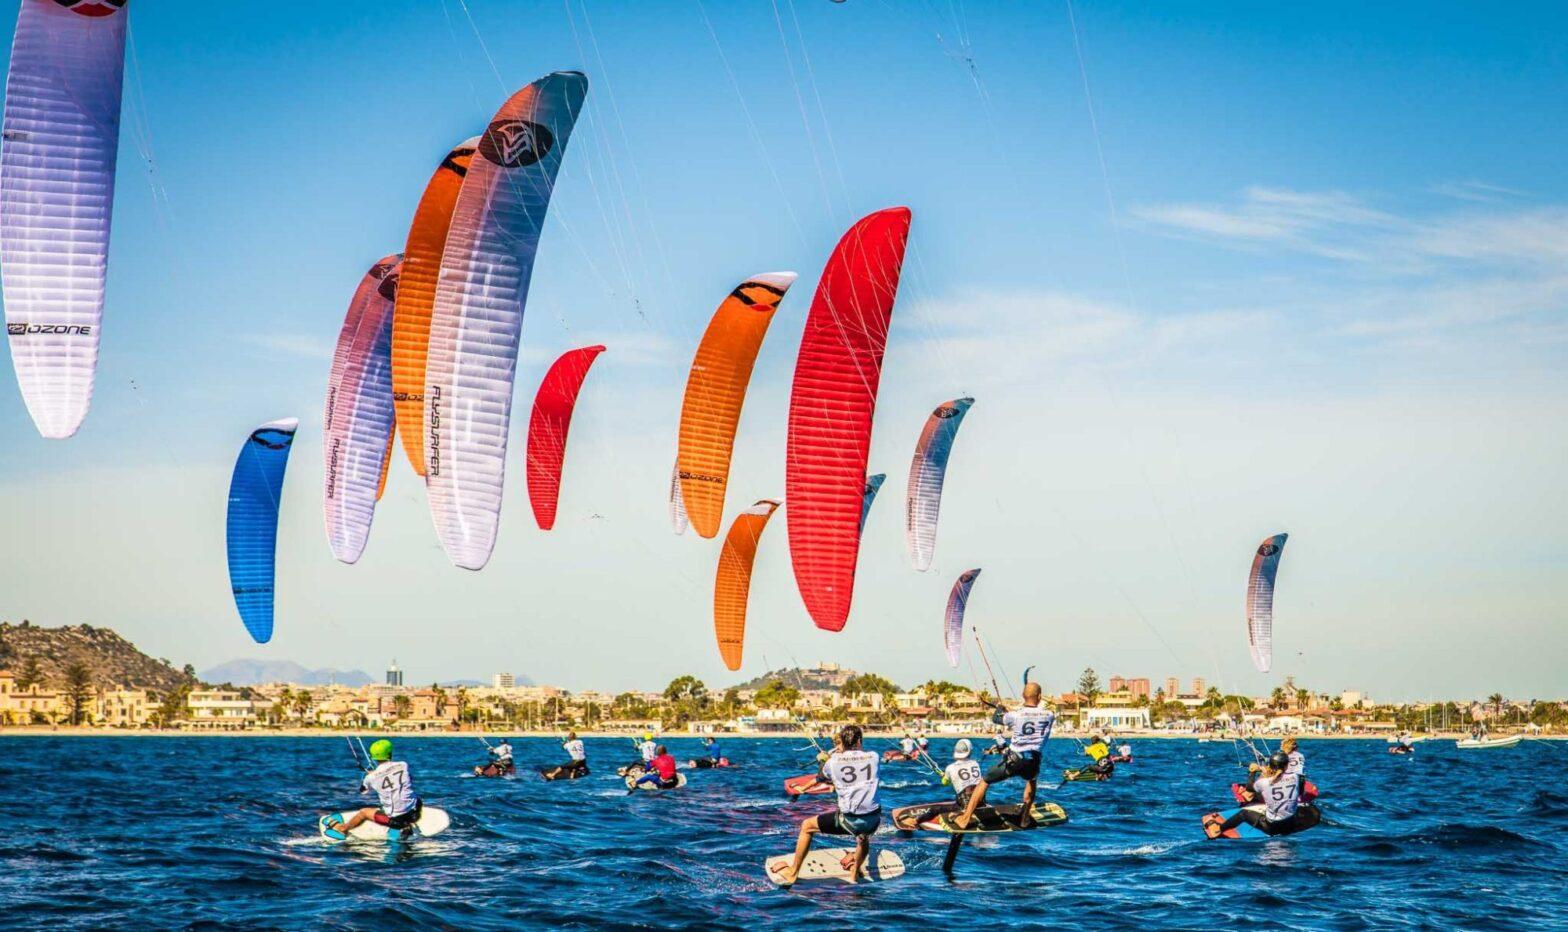 Kiteboarding Sardinia Kite Foil Gold Cup 2017 in Cagliari